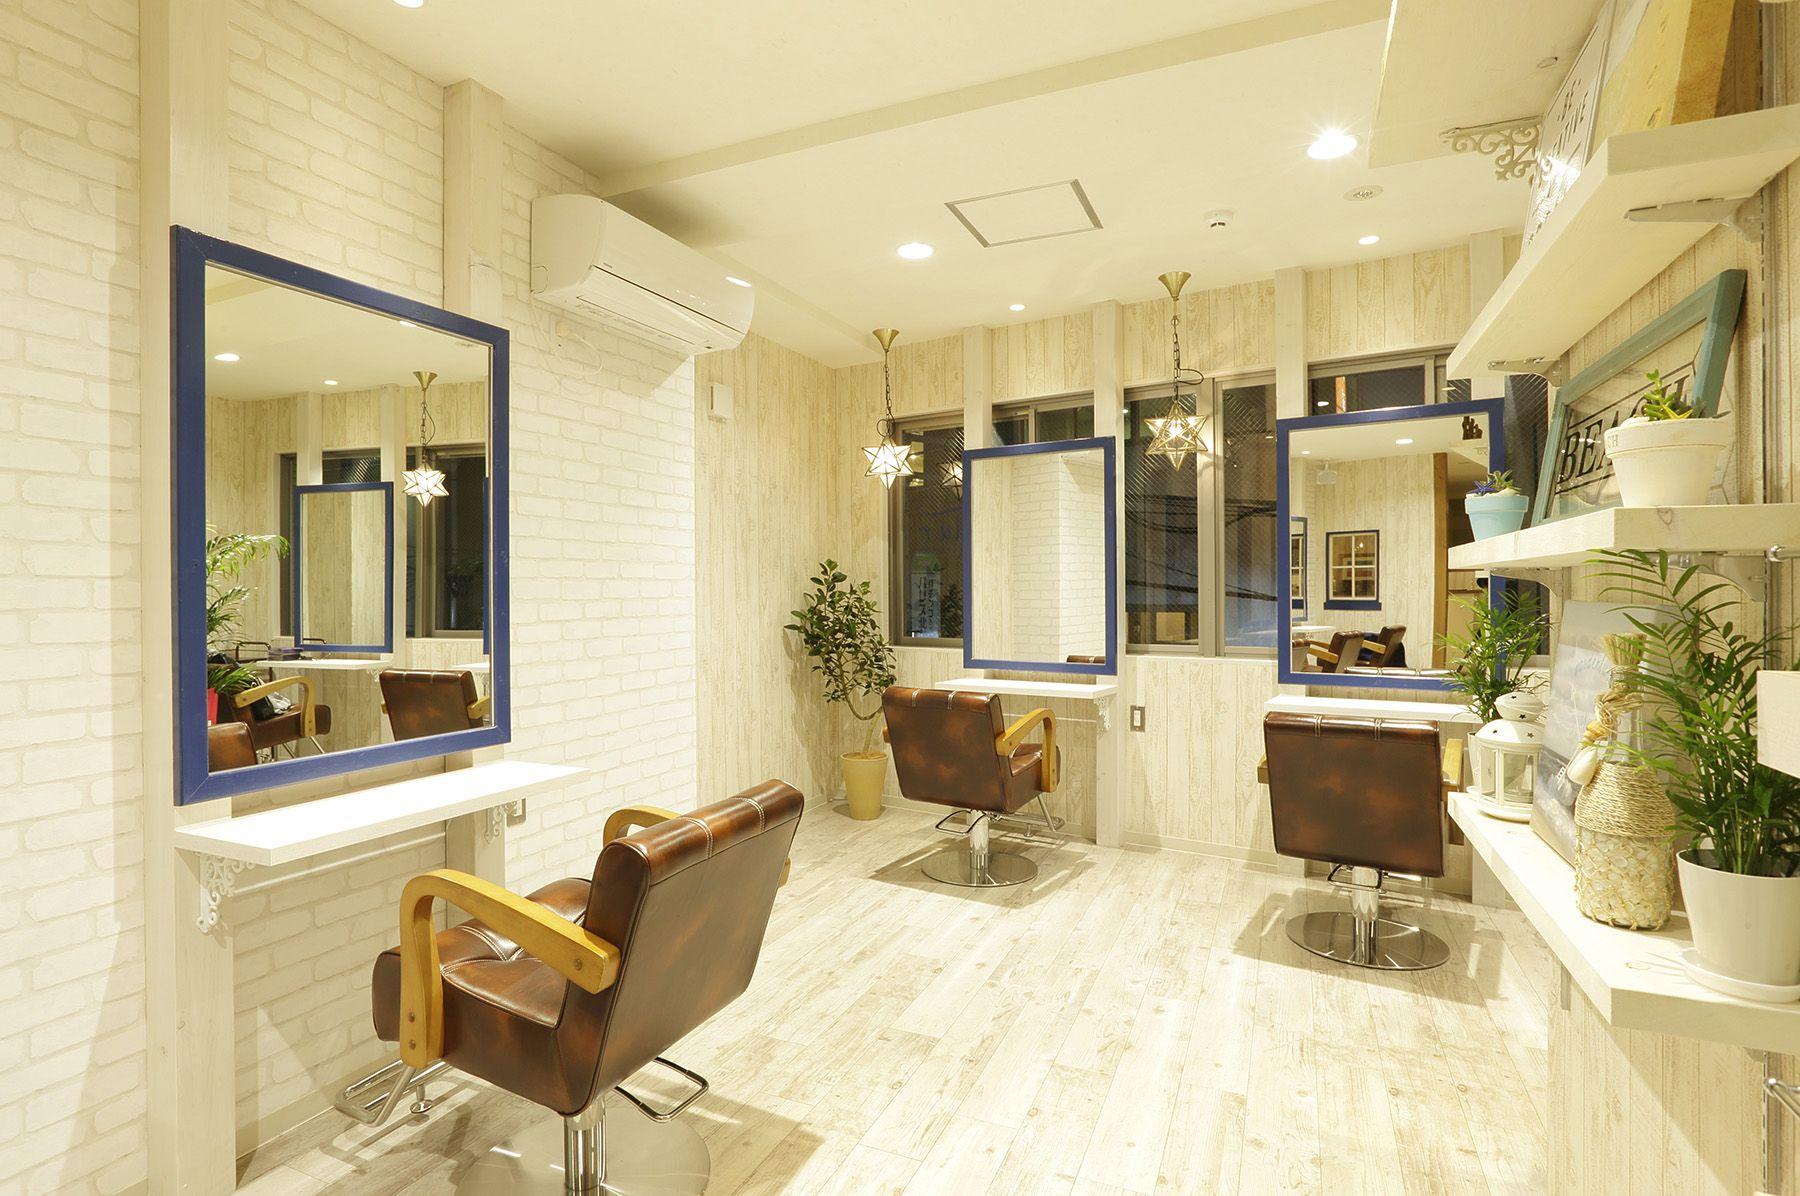 NaTur HAIR & GARDEN - Beauty Salon Interior Design  Salon